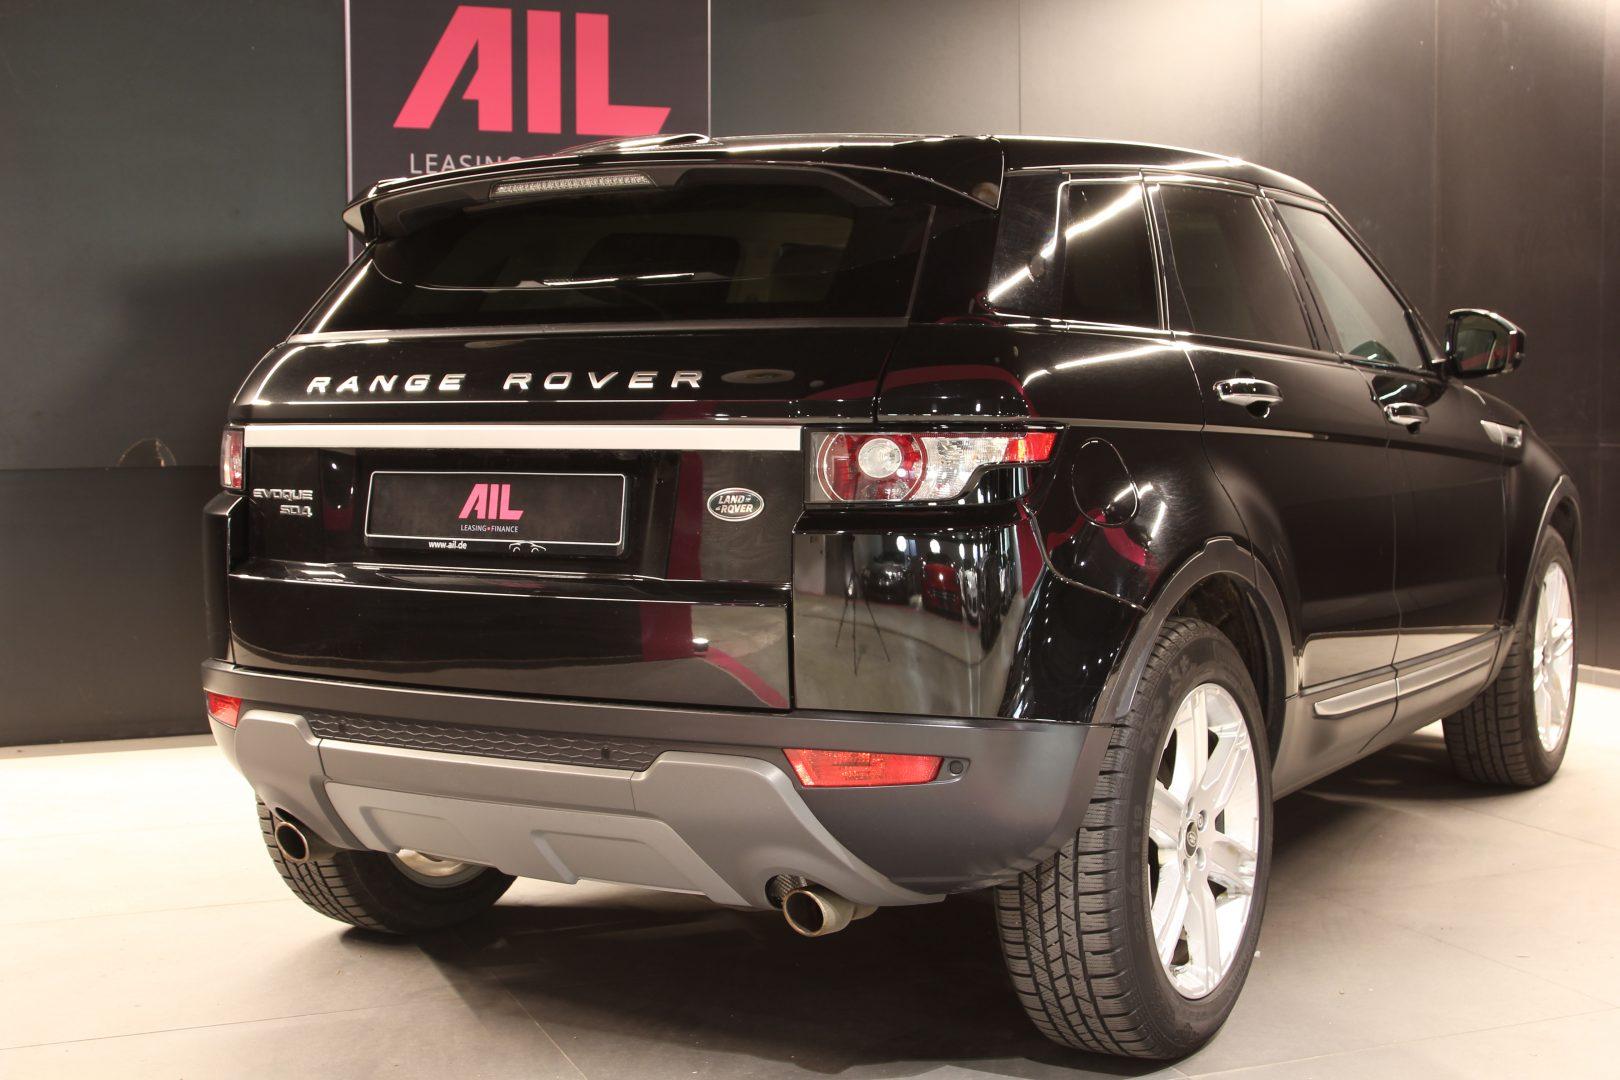 AIL Land Rover Range Rover Evoque Prestige 7